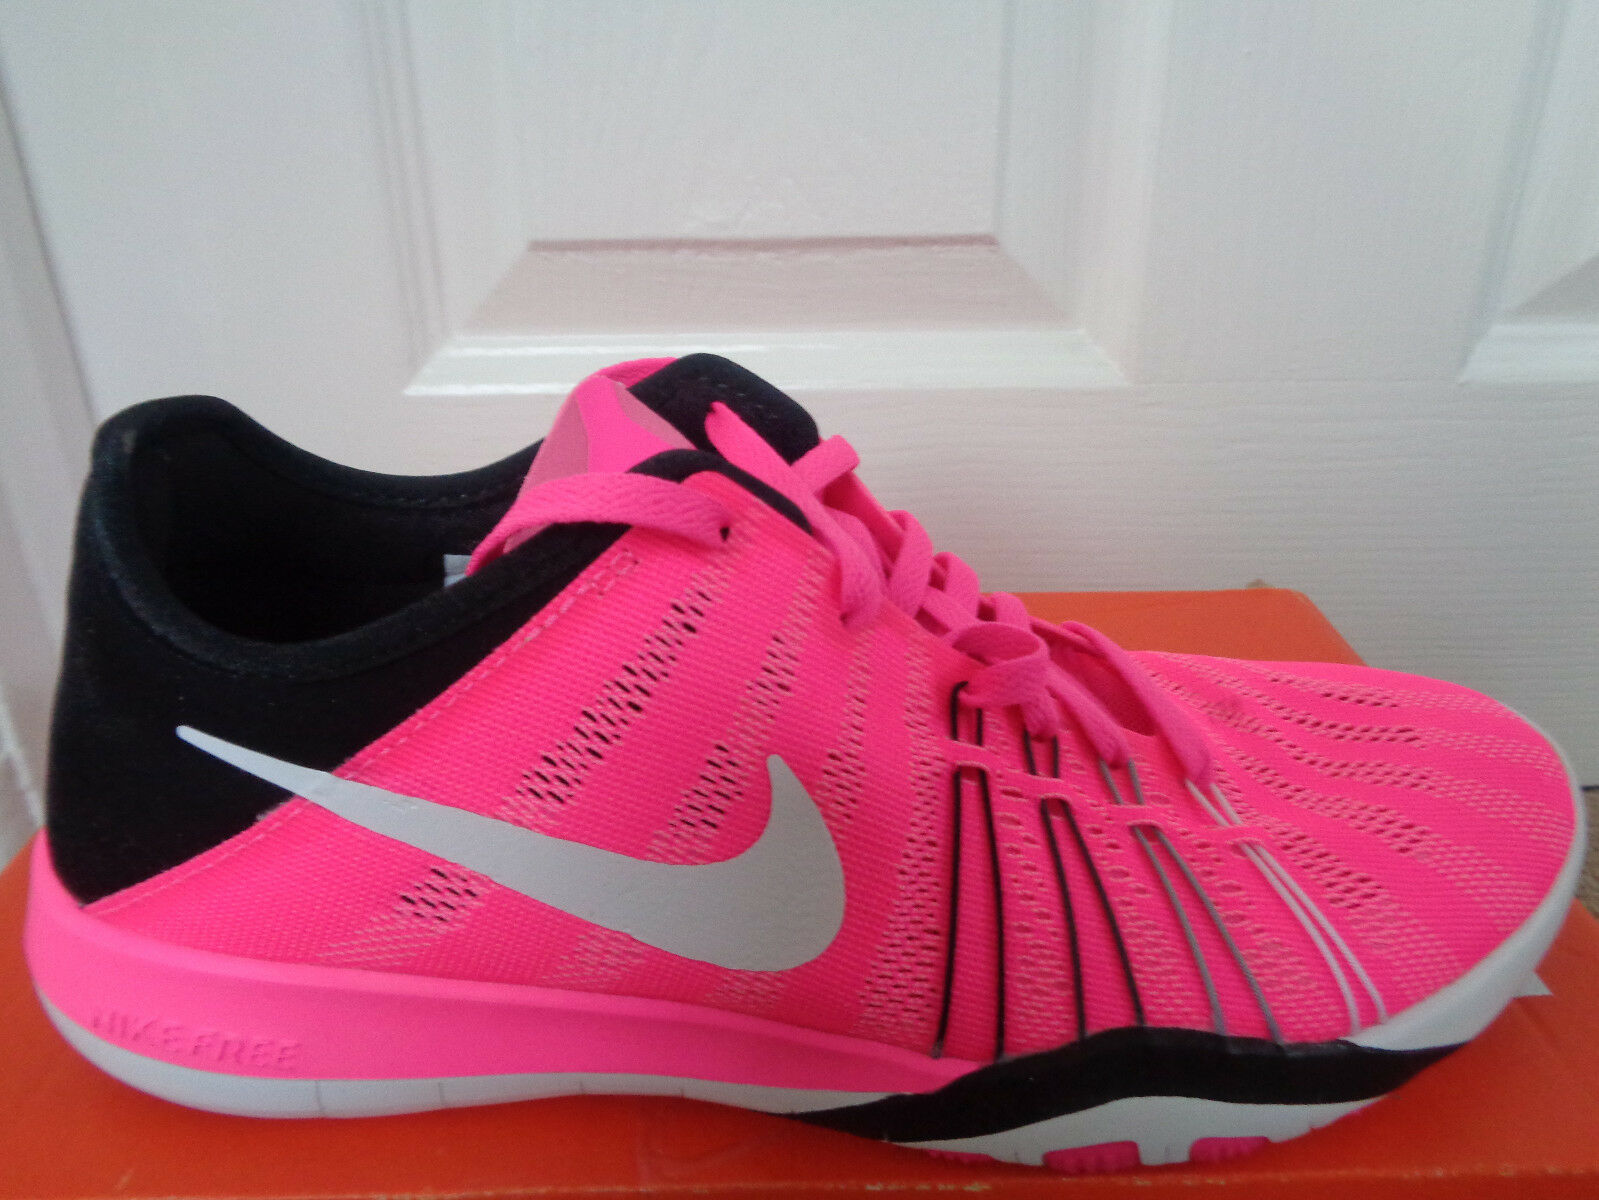 Nike Free 5.0 TR 6 wmns trainers schuhe 833413 600 uk 4 eu 37.5 us 6.5 NEW+BOX